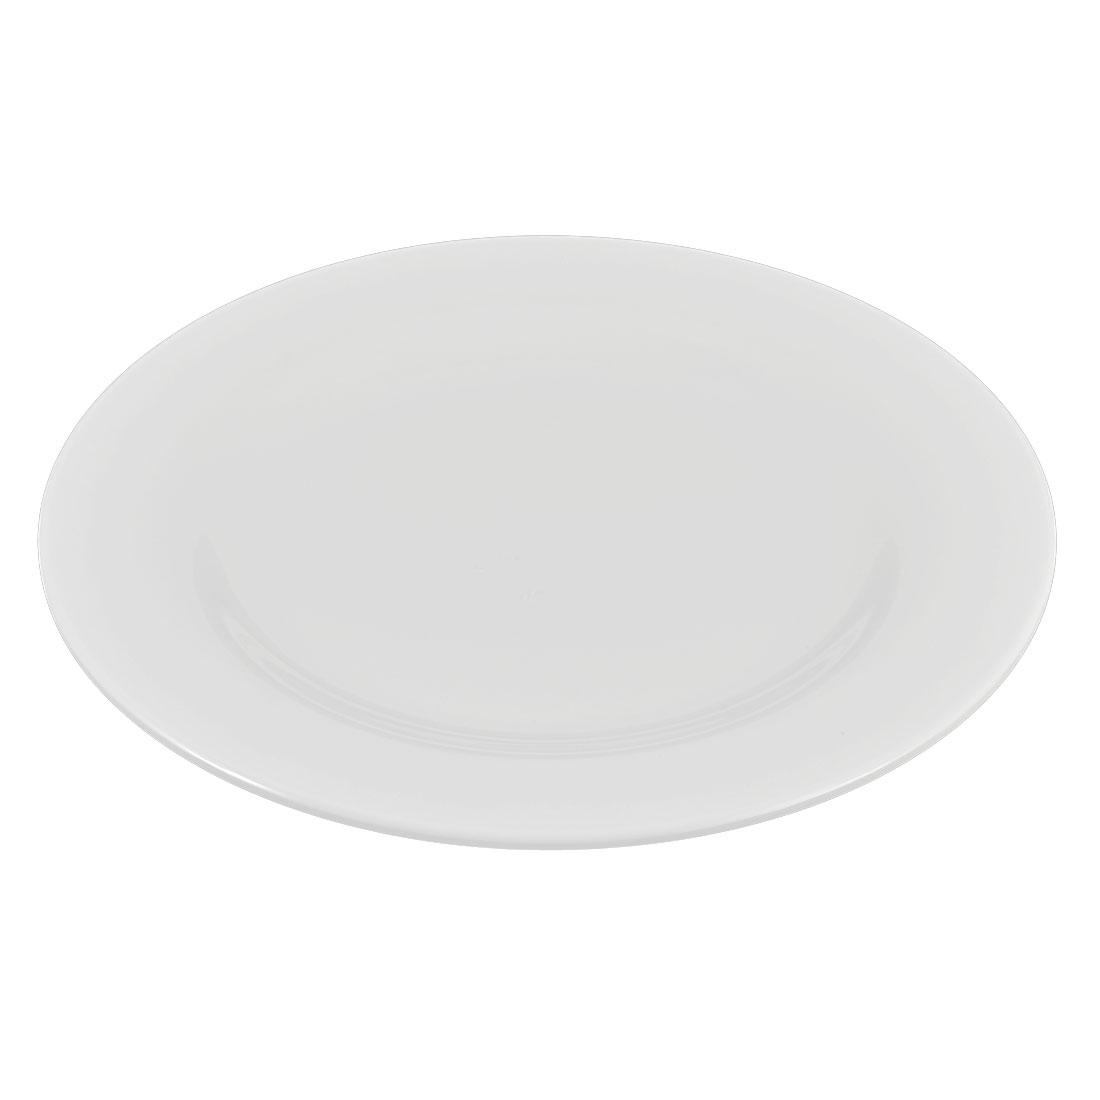 Restaurant Hotel Tableware Plastic Dessert Food Dish Plate Tray Container